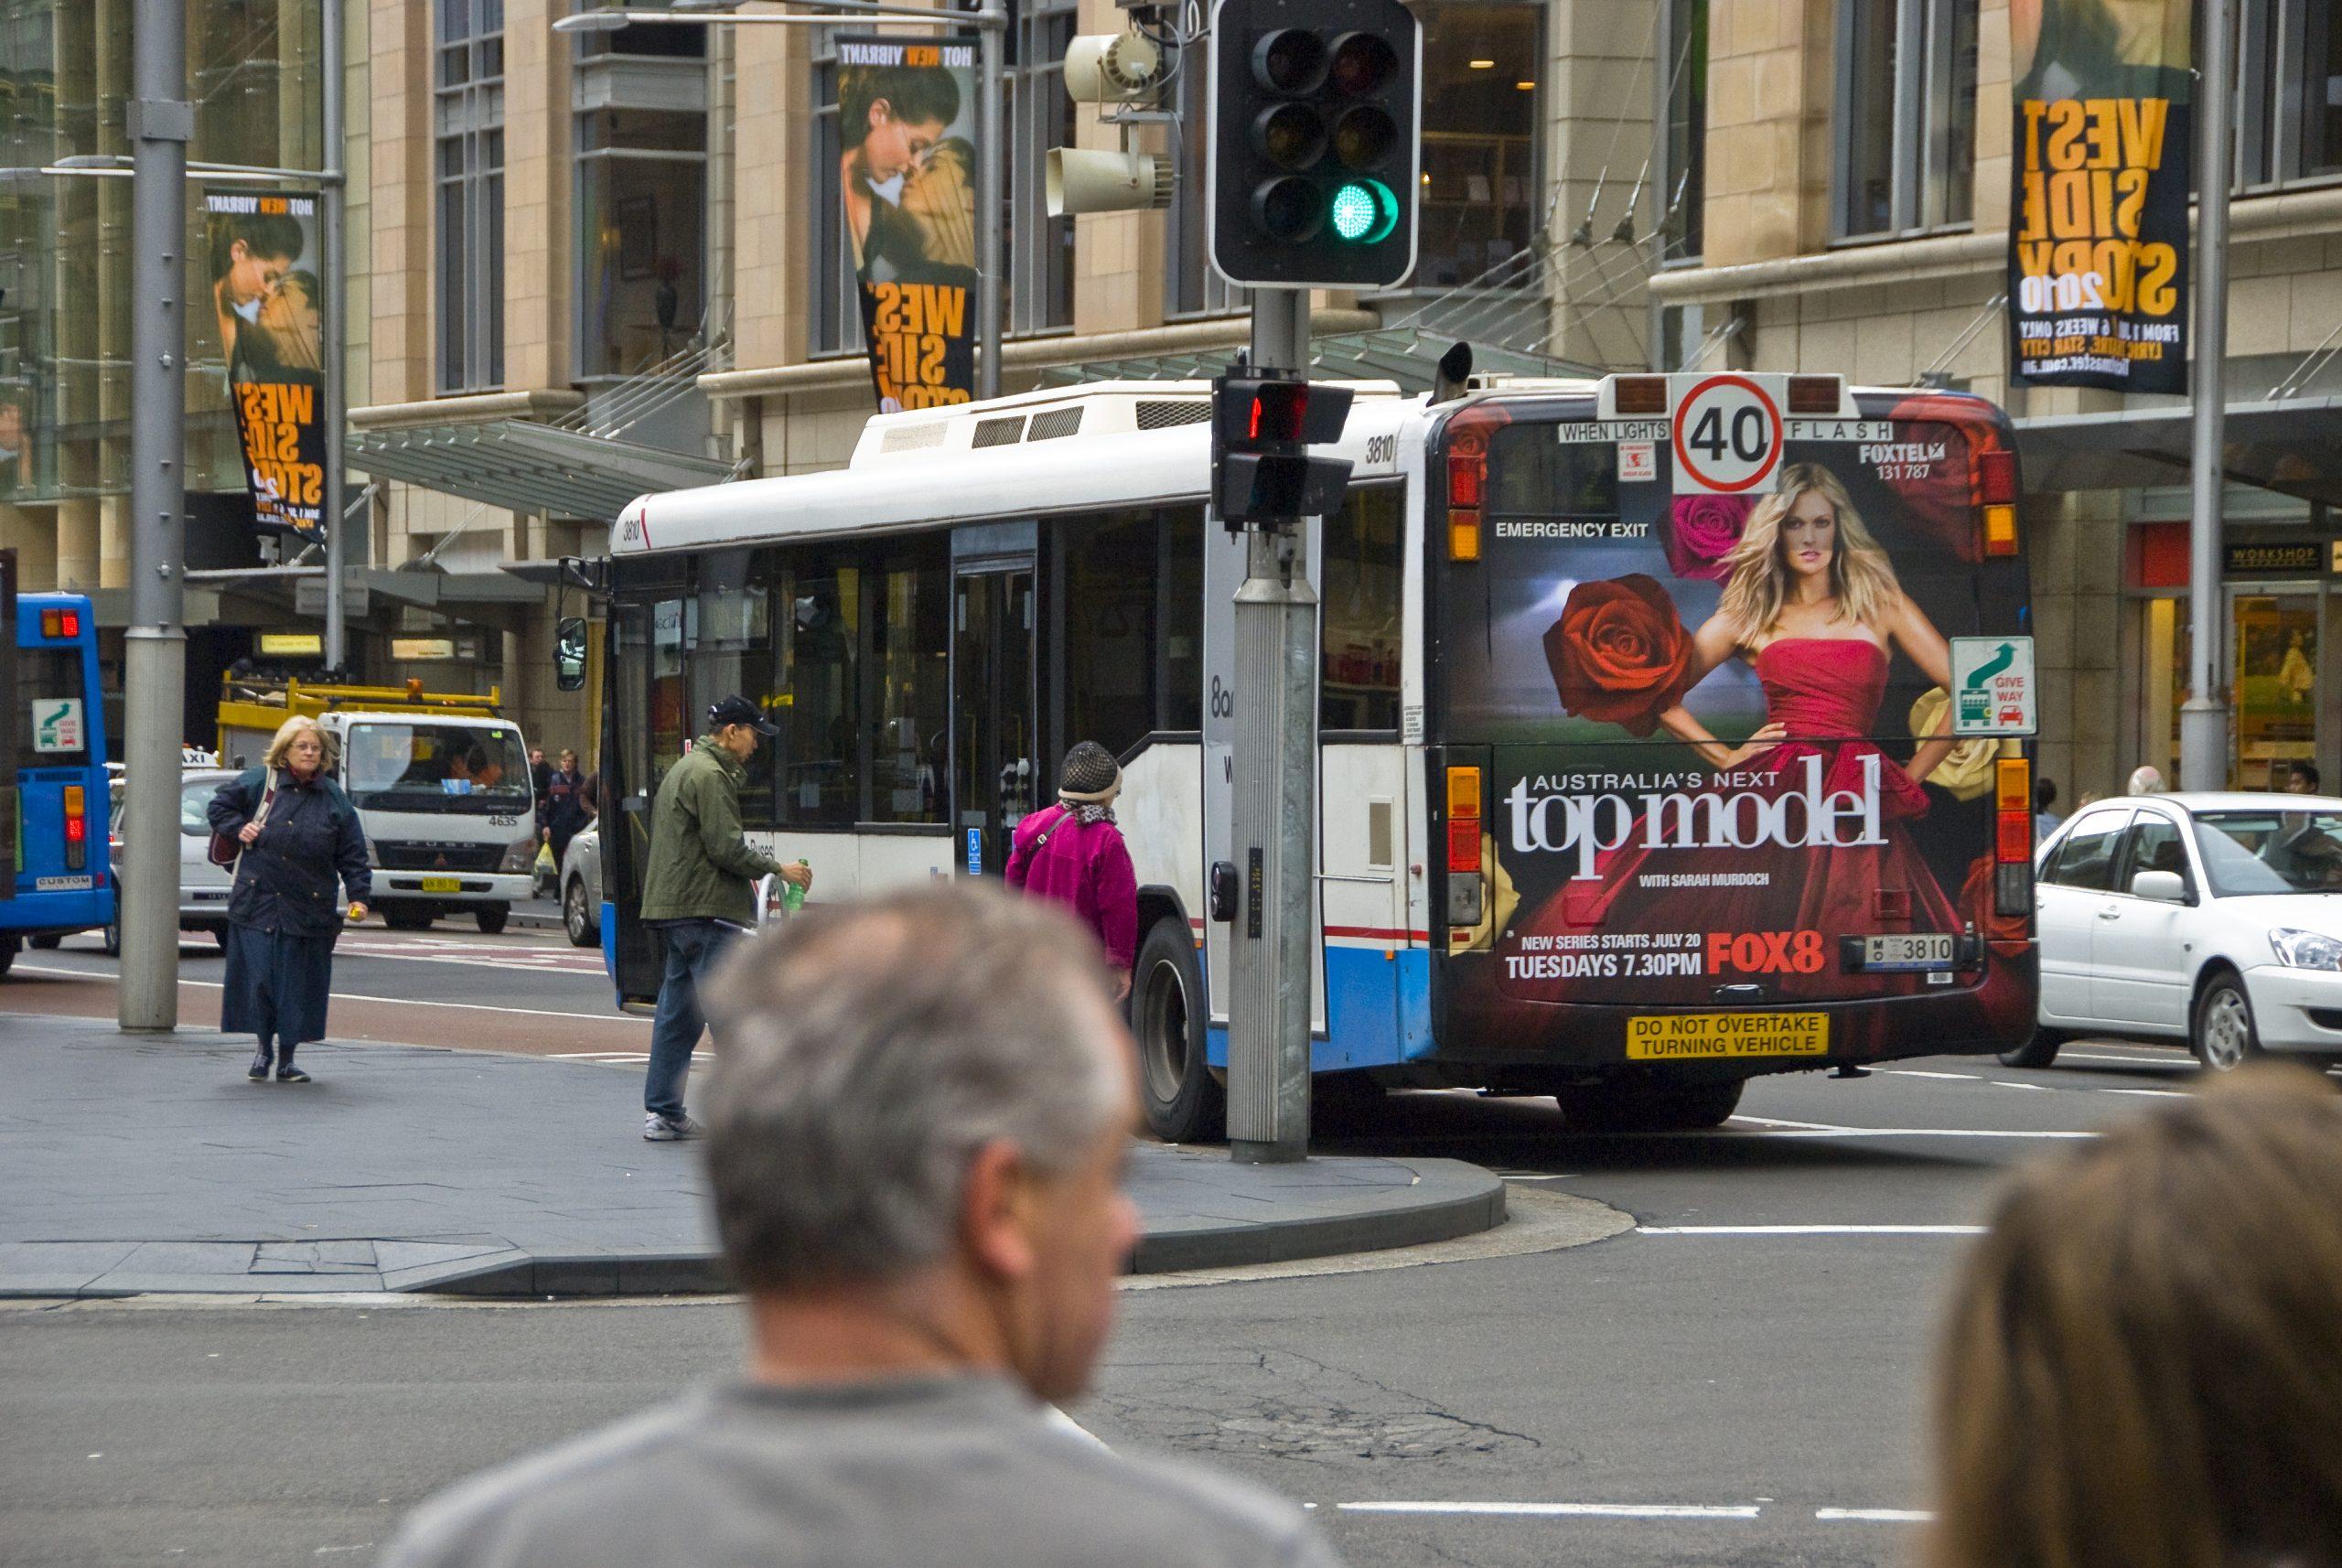 Australias Next Top Model Bus Back Window Advertisement